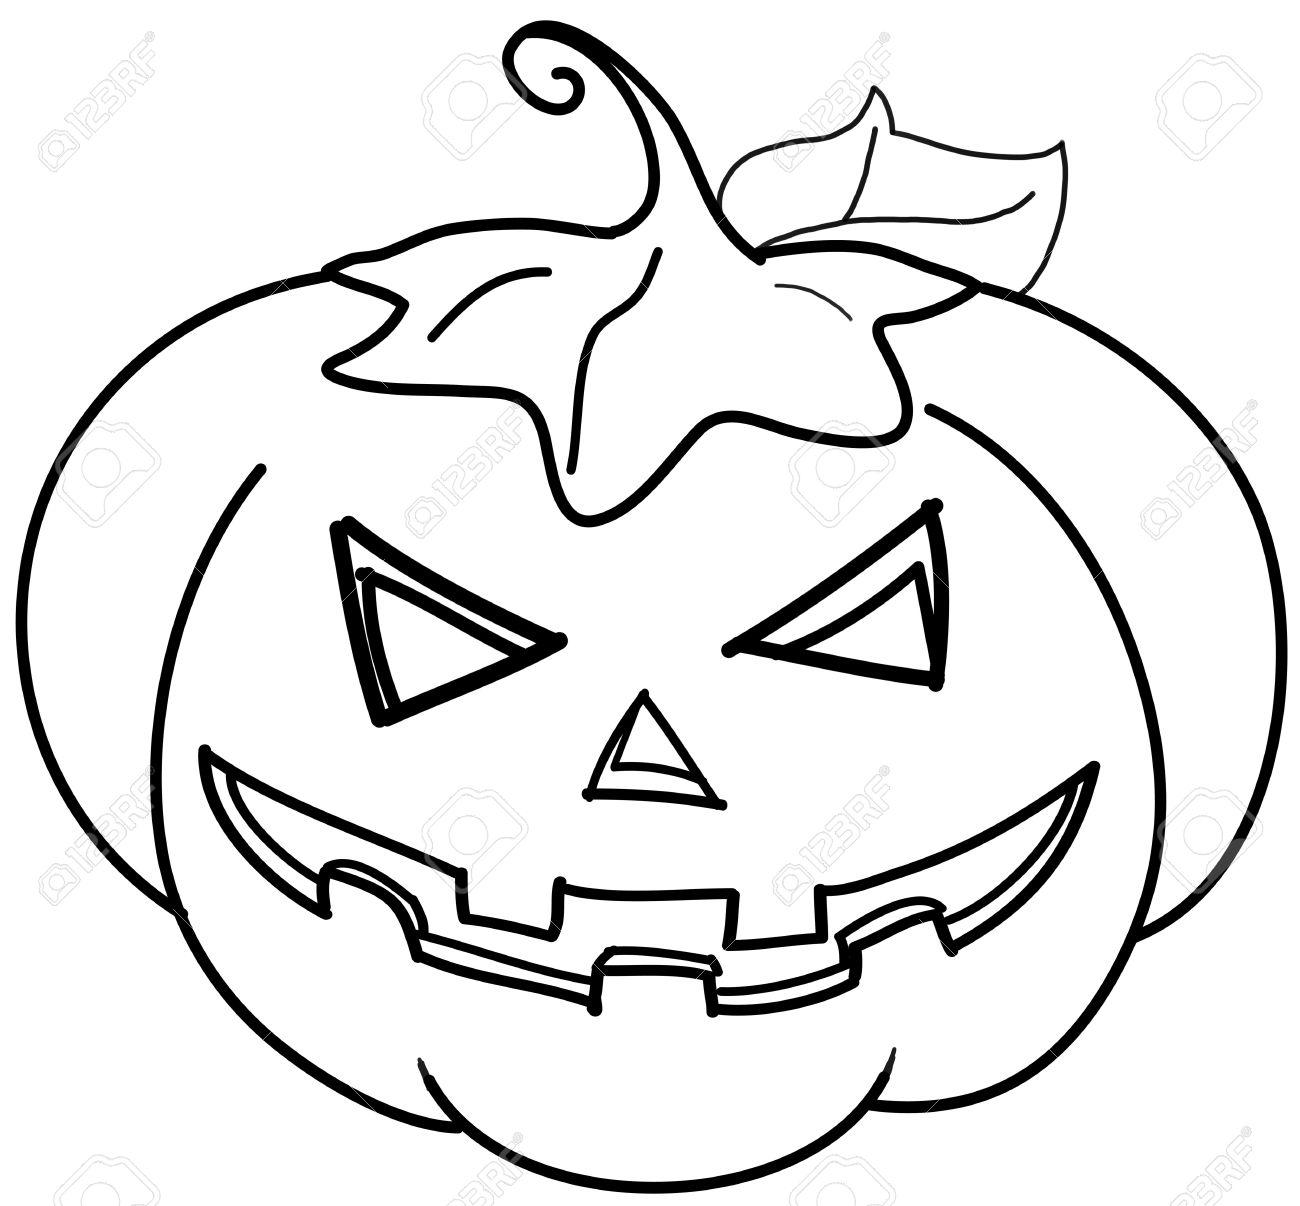 Jack-o-lantern Halloween Pumpkin Coloring Digital Illustration Stock ...